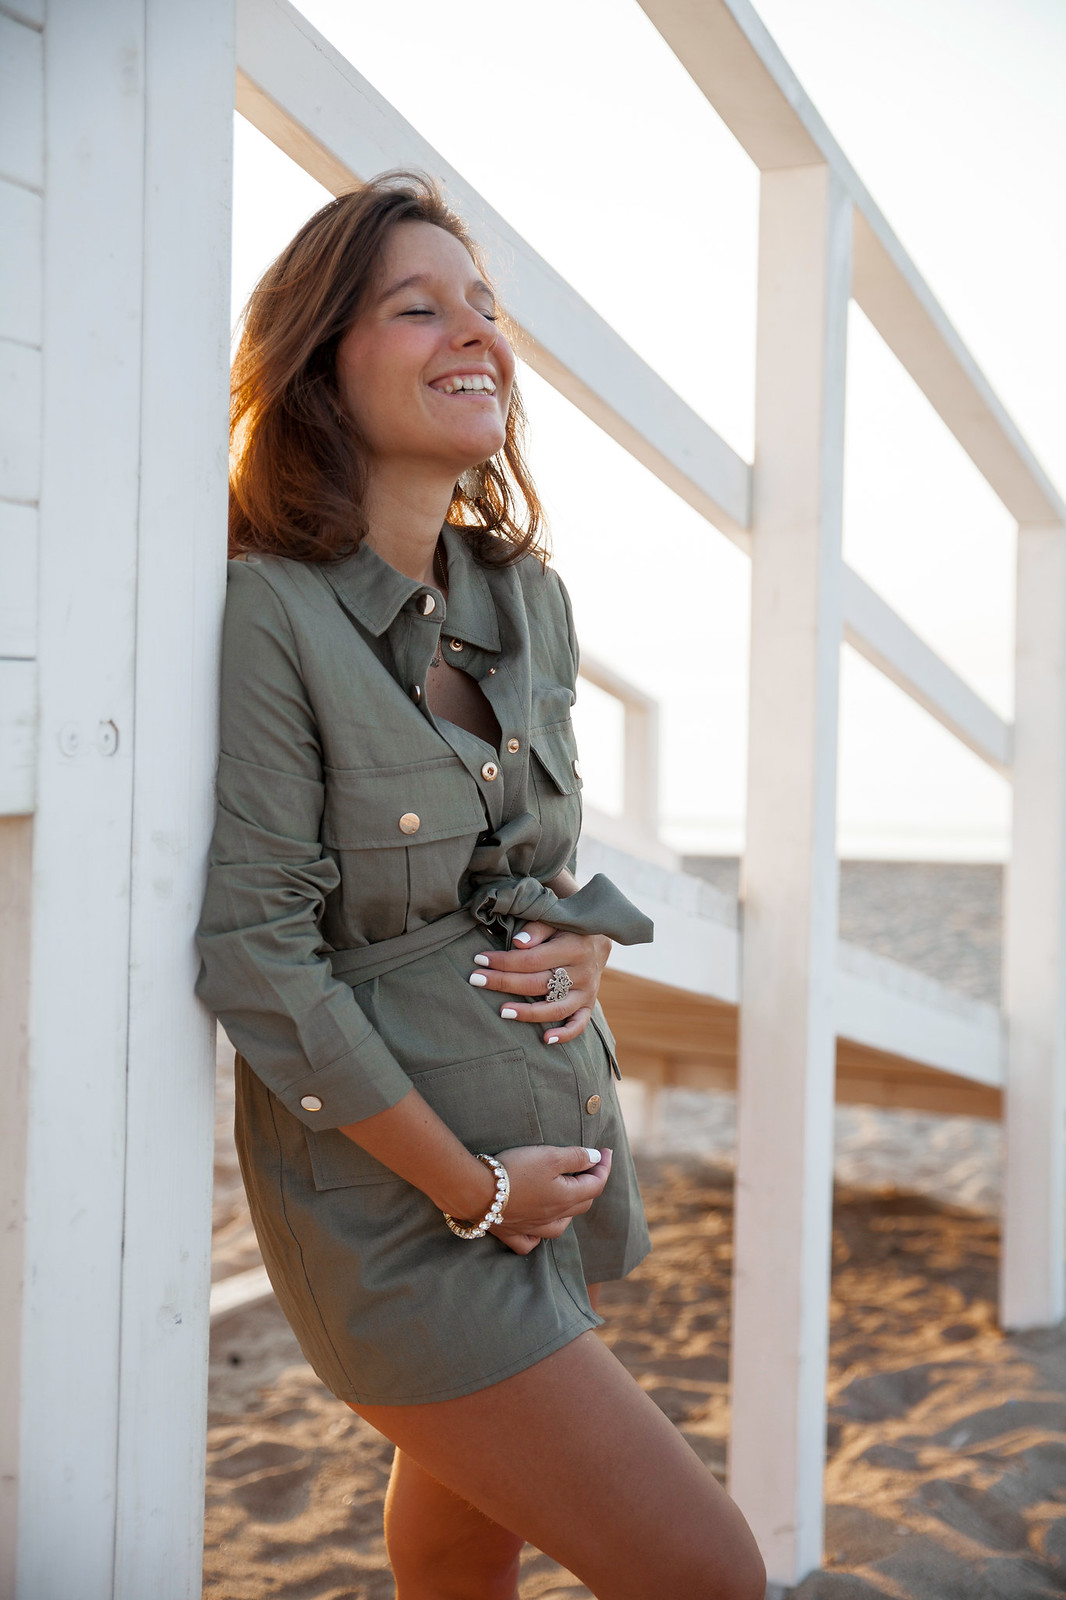 influencer happy spain new york hamptons style fashion blogger loavies new co autumn 2019 laura santolaria theguestgirl embarazada semana a semana loavies nueva coleccion otoño